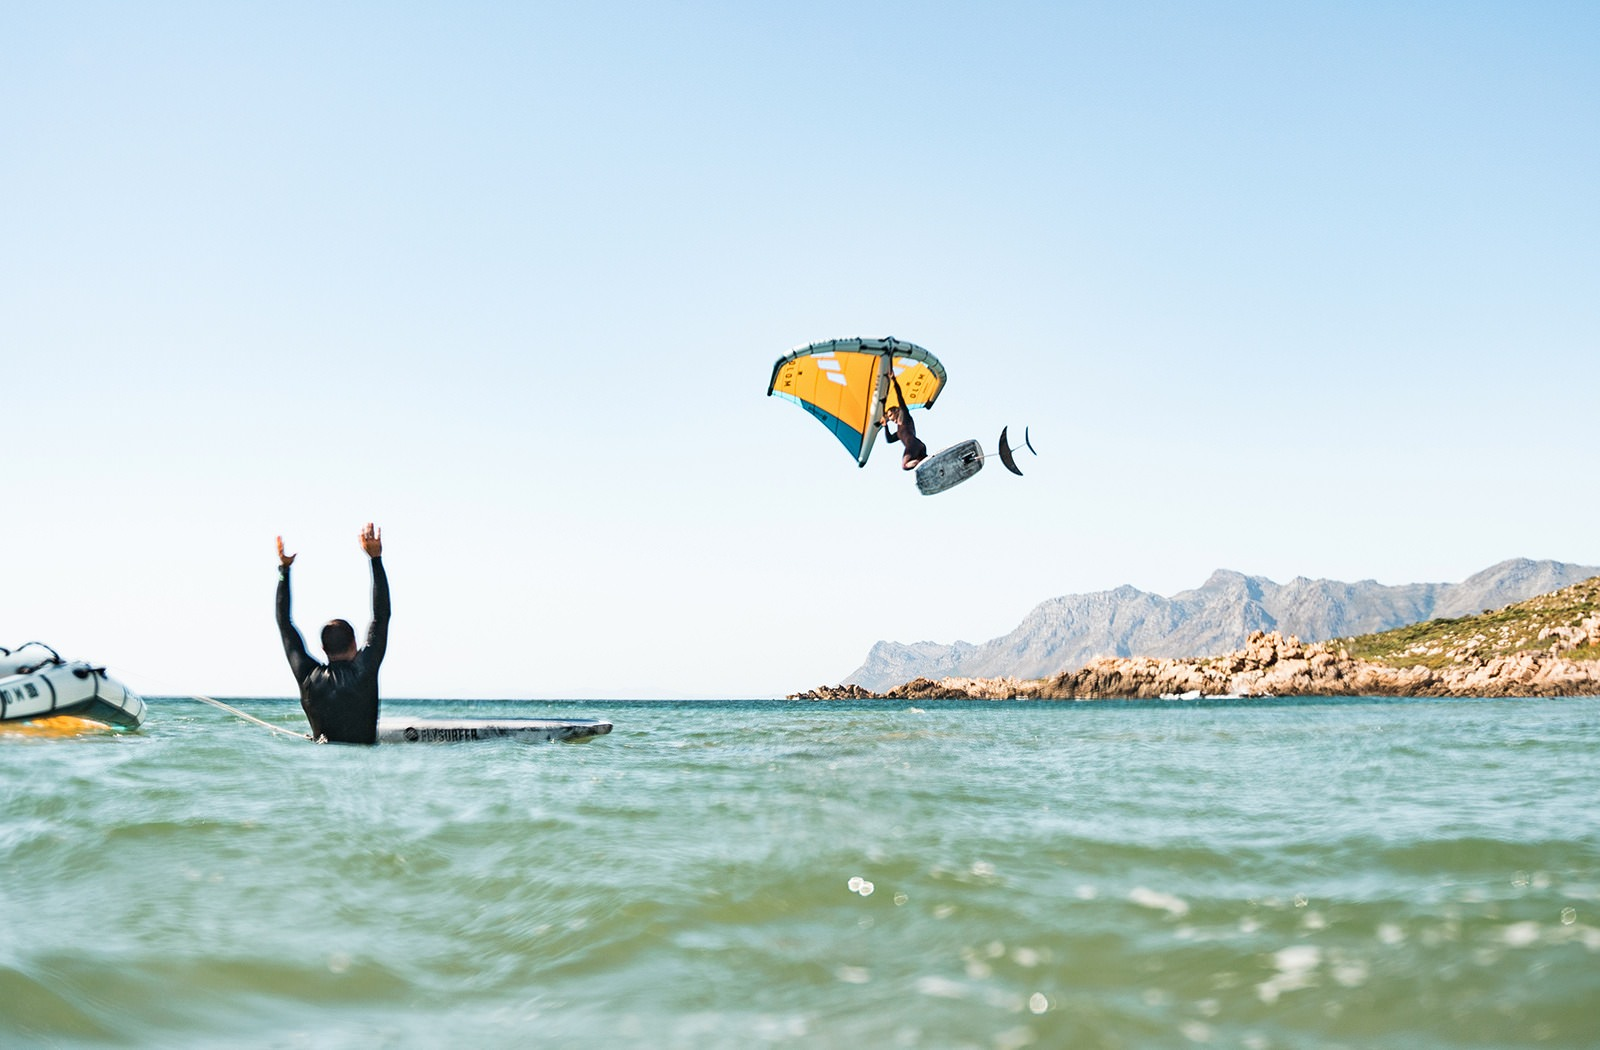 Flysurfer-MOJO-05-by-MiriamJoanna